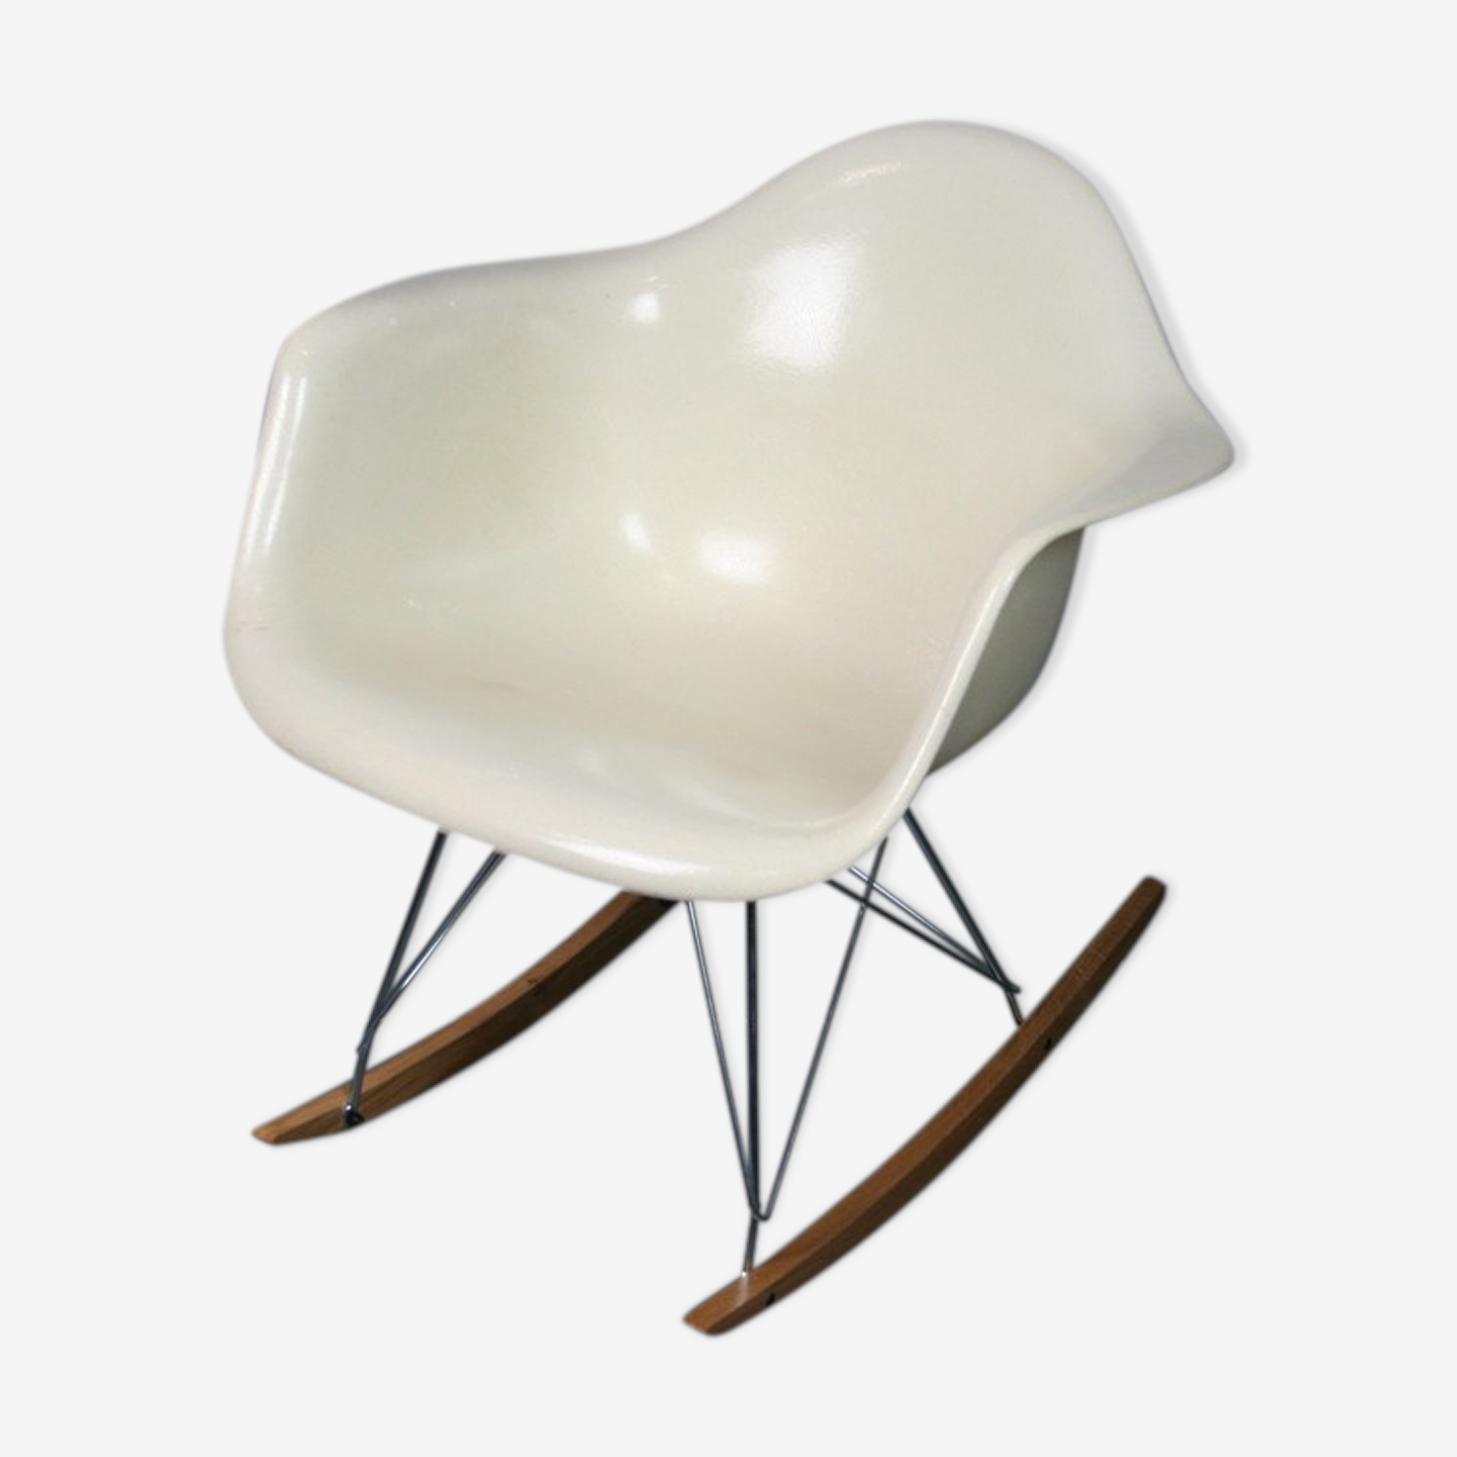 Rocking chair rar parchemin blanc Eames Herman Miller